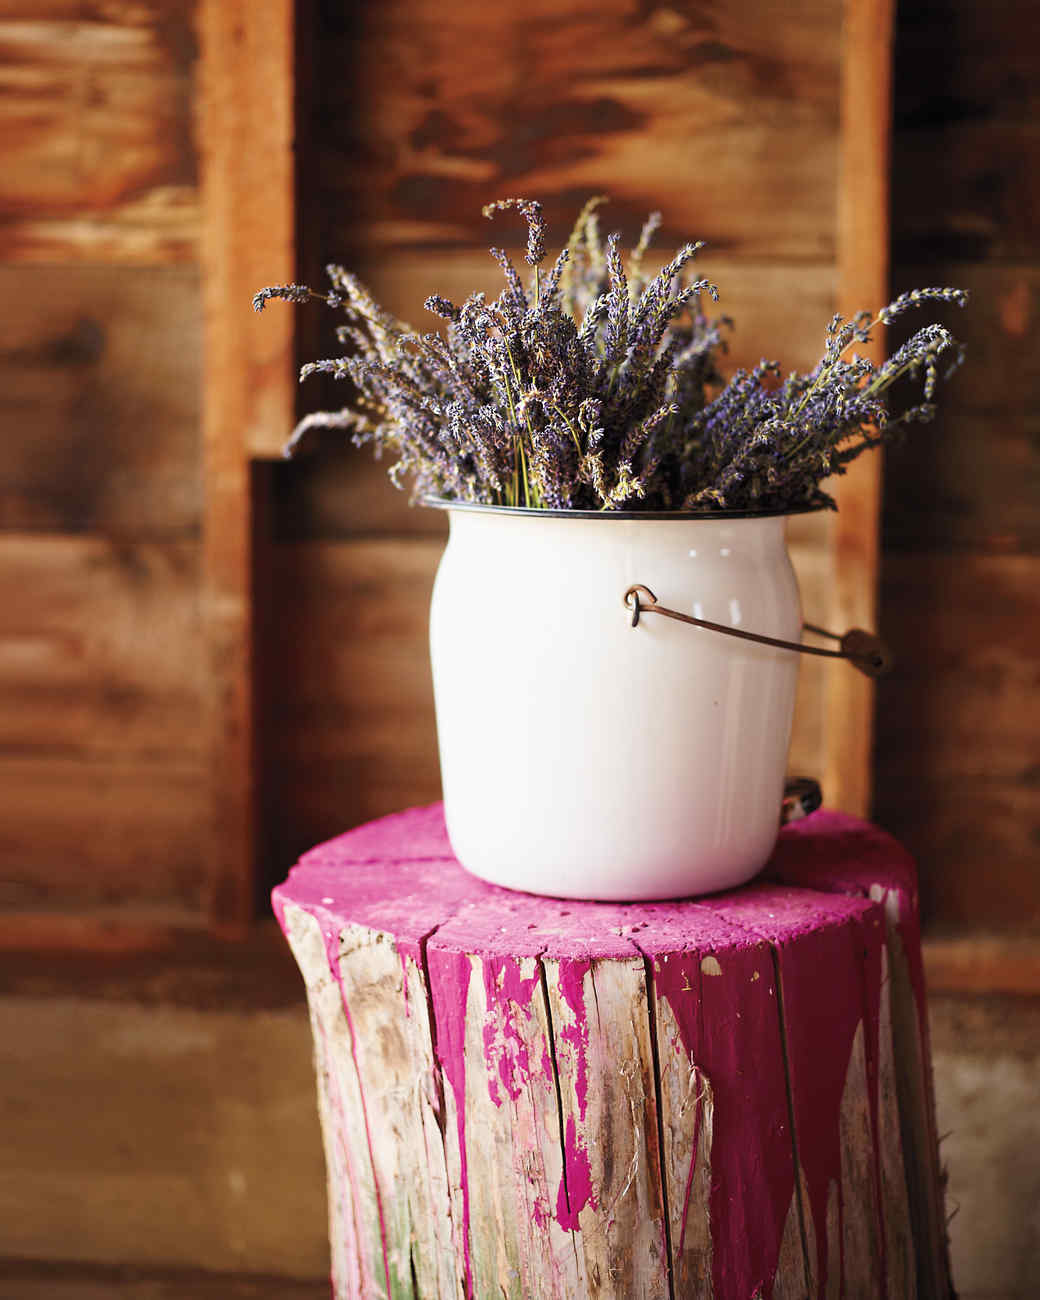 lavender-chontos-11-cf040024-ma120730.jpg